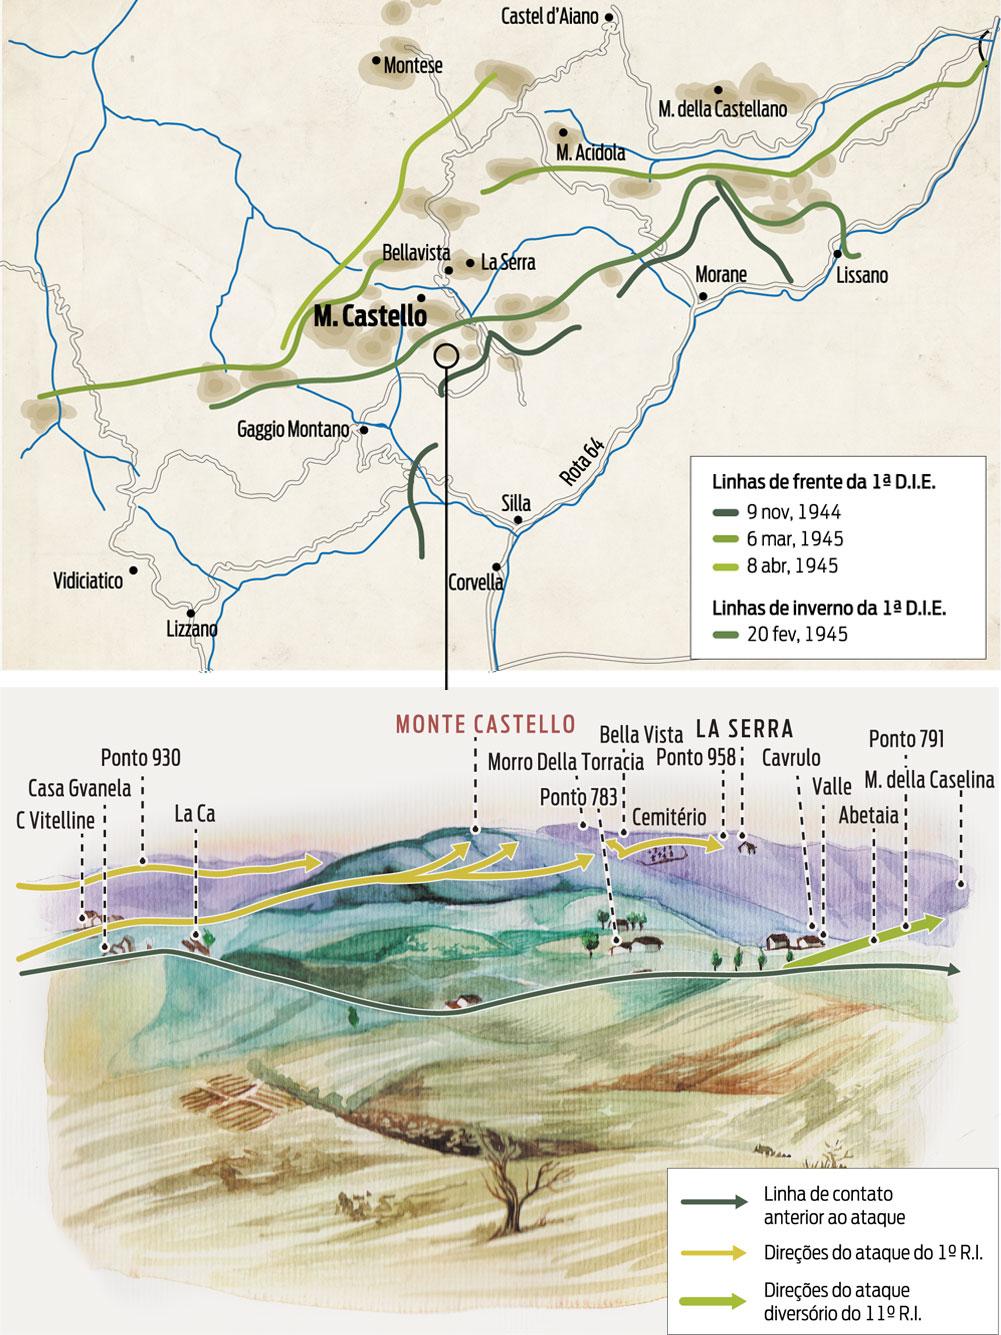 Mapa de Monte Castelo